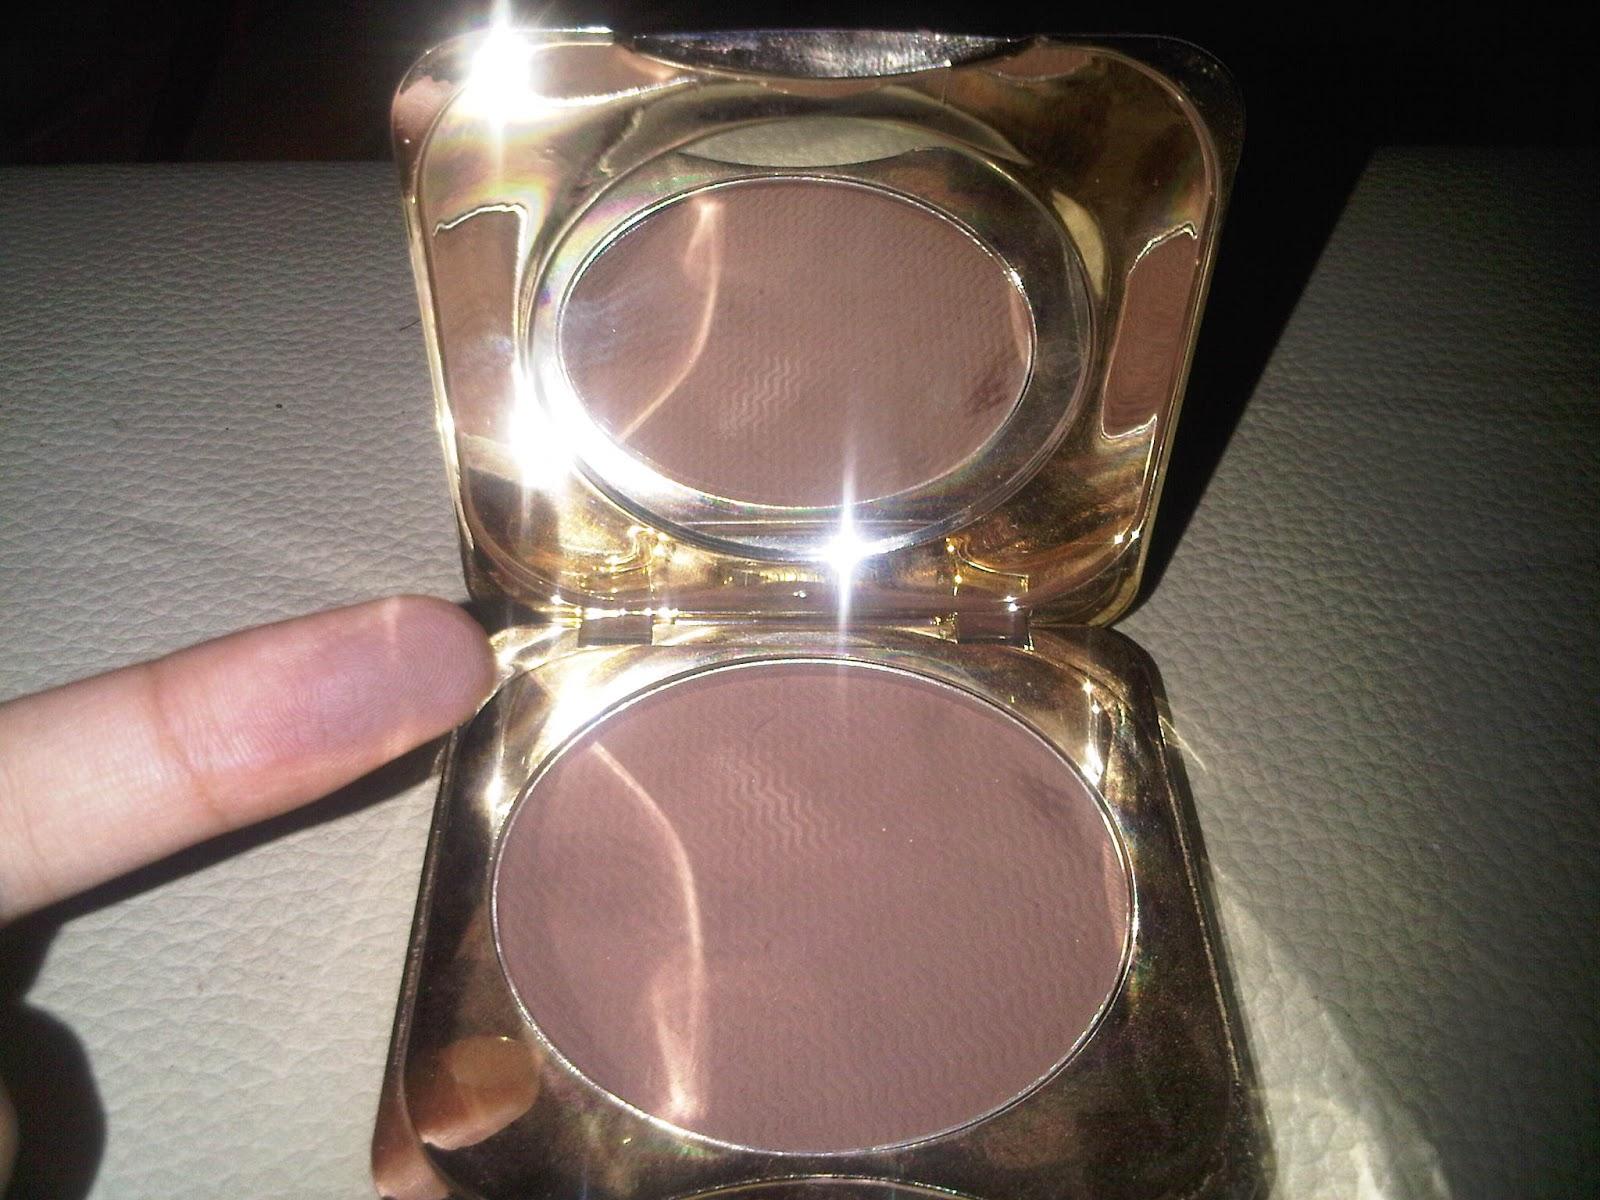 Fanbo Gold Classic Compact Powder 01 Coklat Mahakam